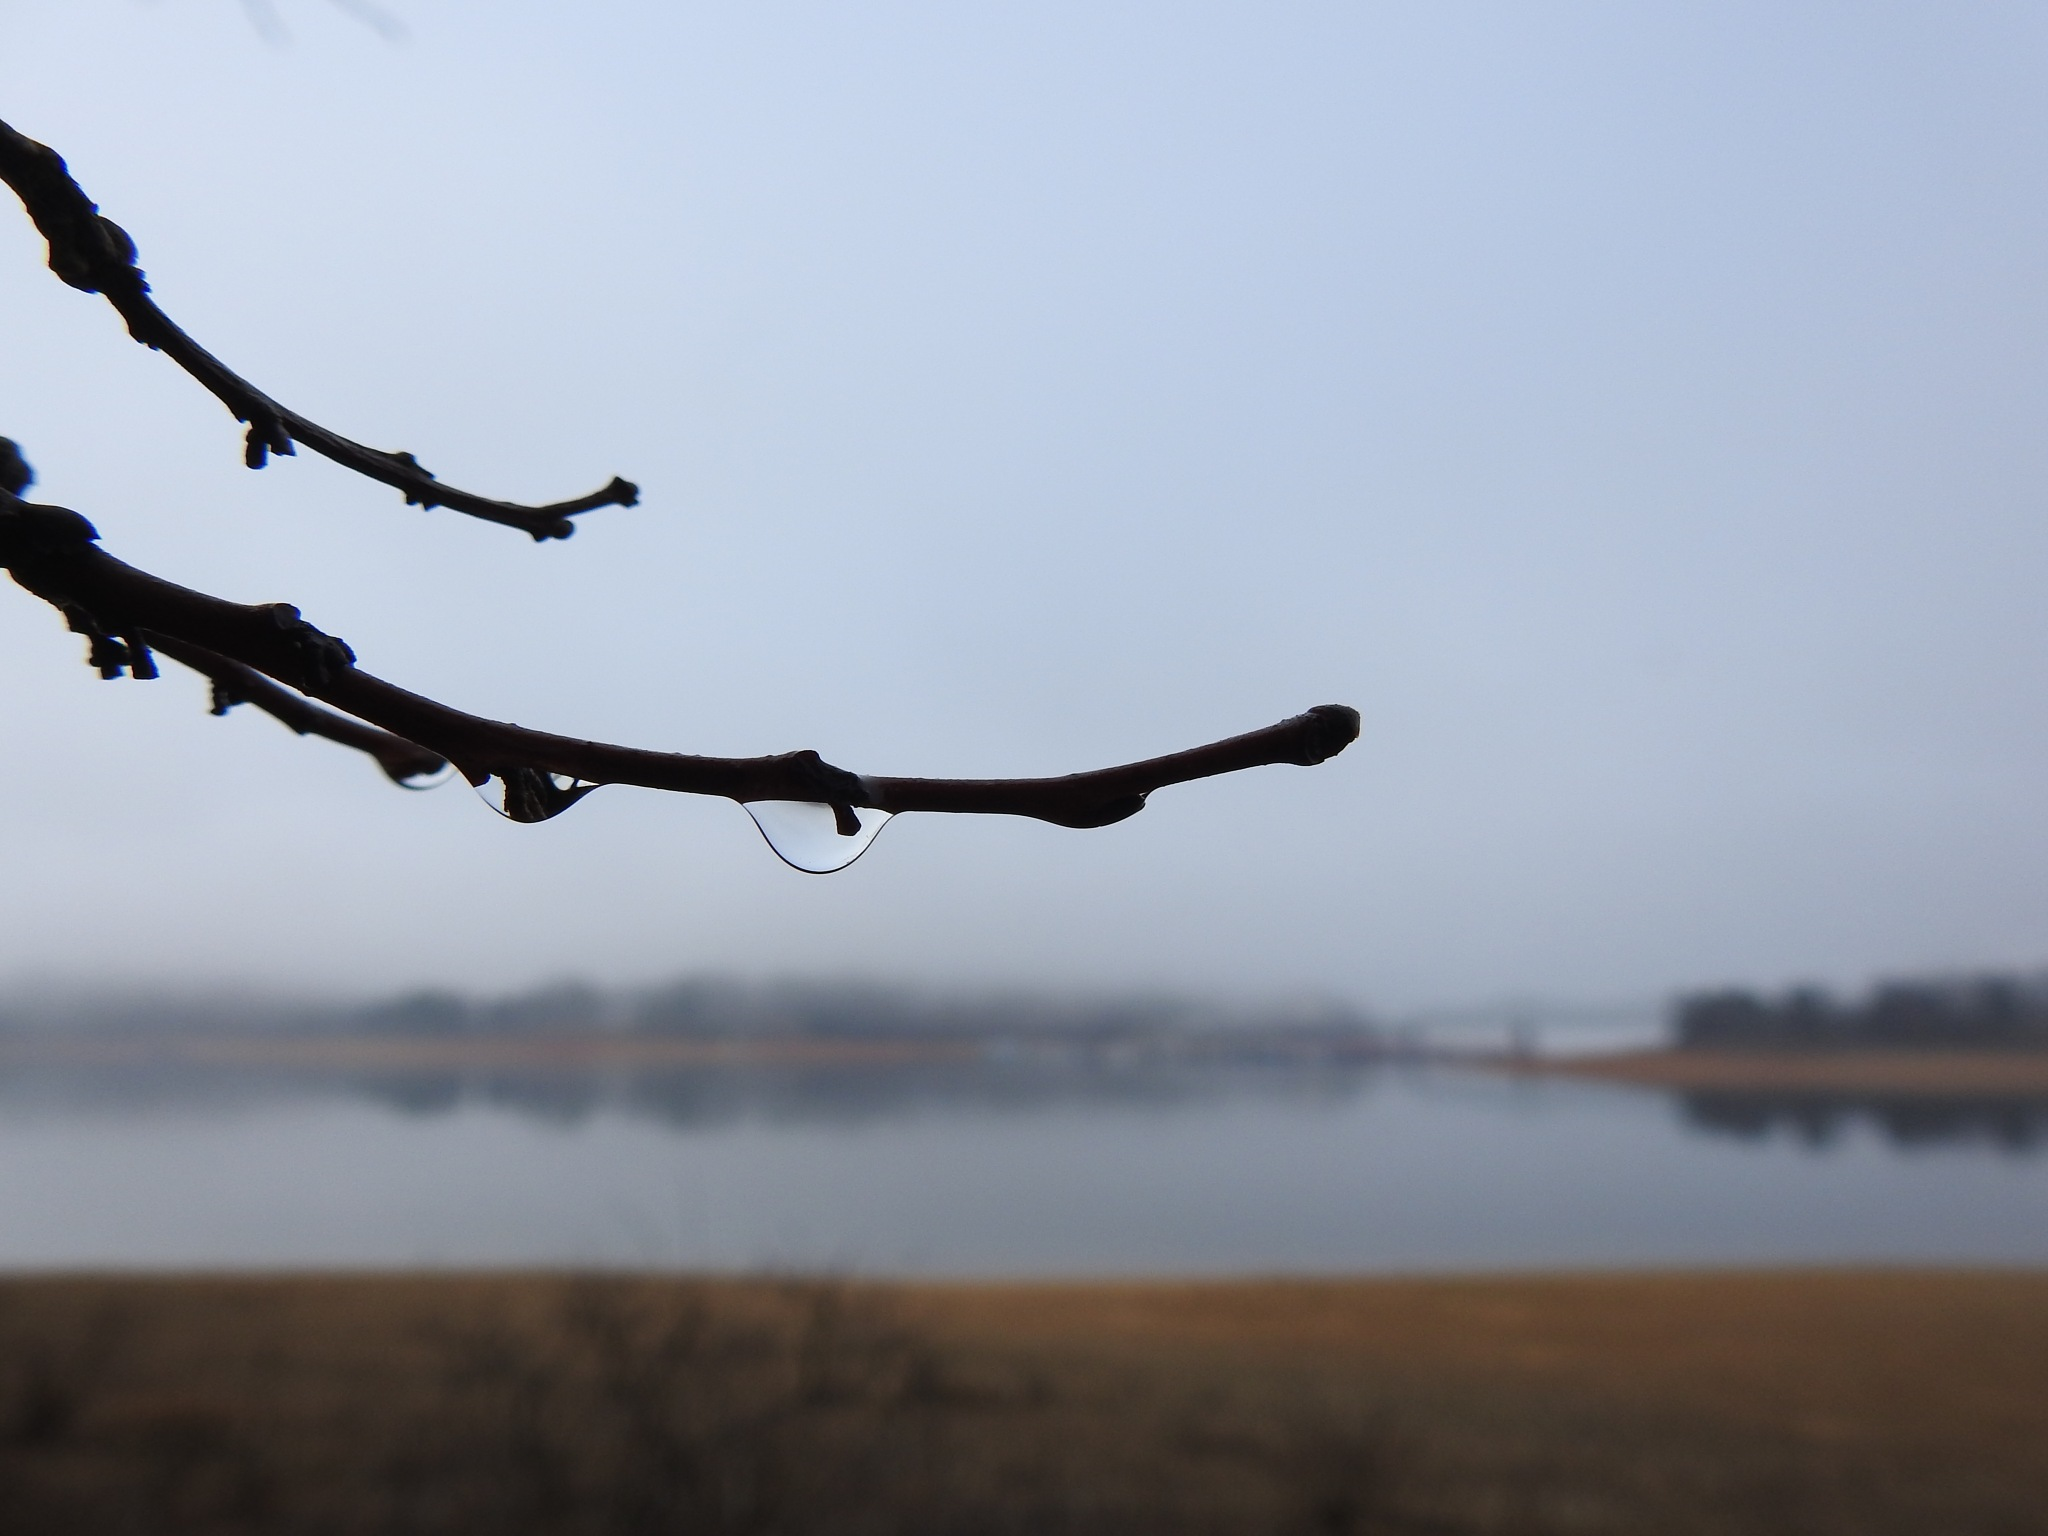 Morning Lake Fog Dew Drop by Patty Stockton